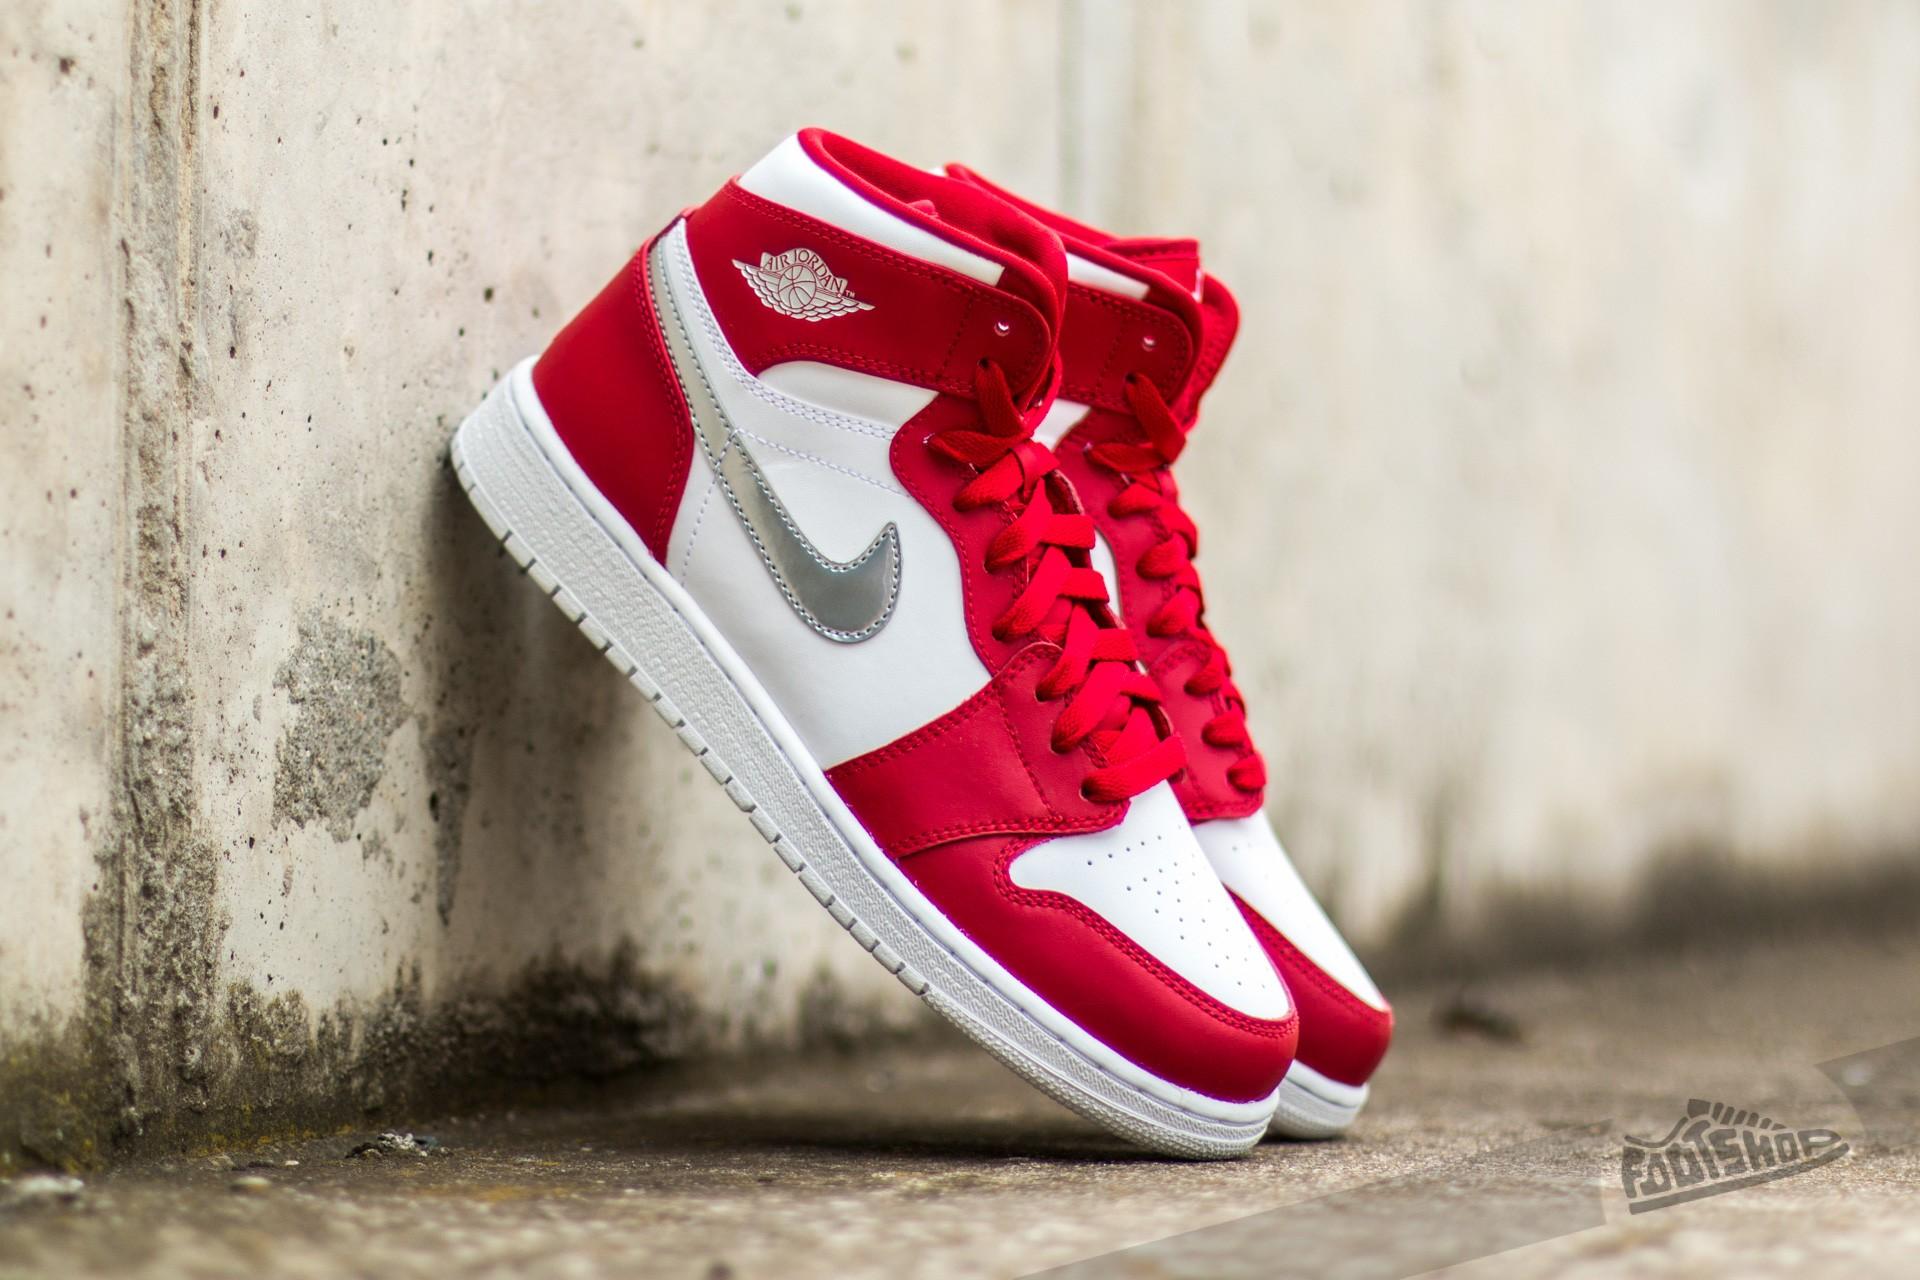 Air Jordan 1 Retro High (BG) Gym Red